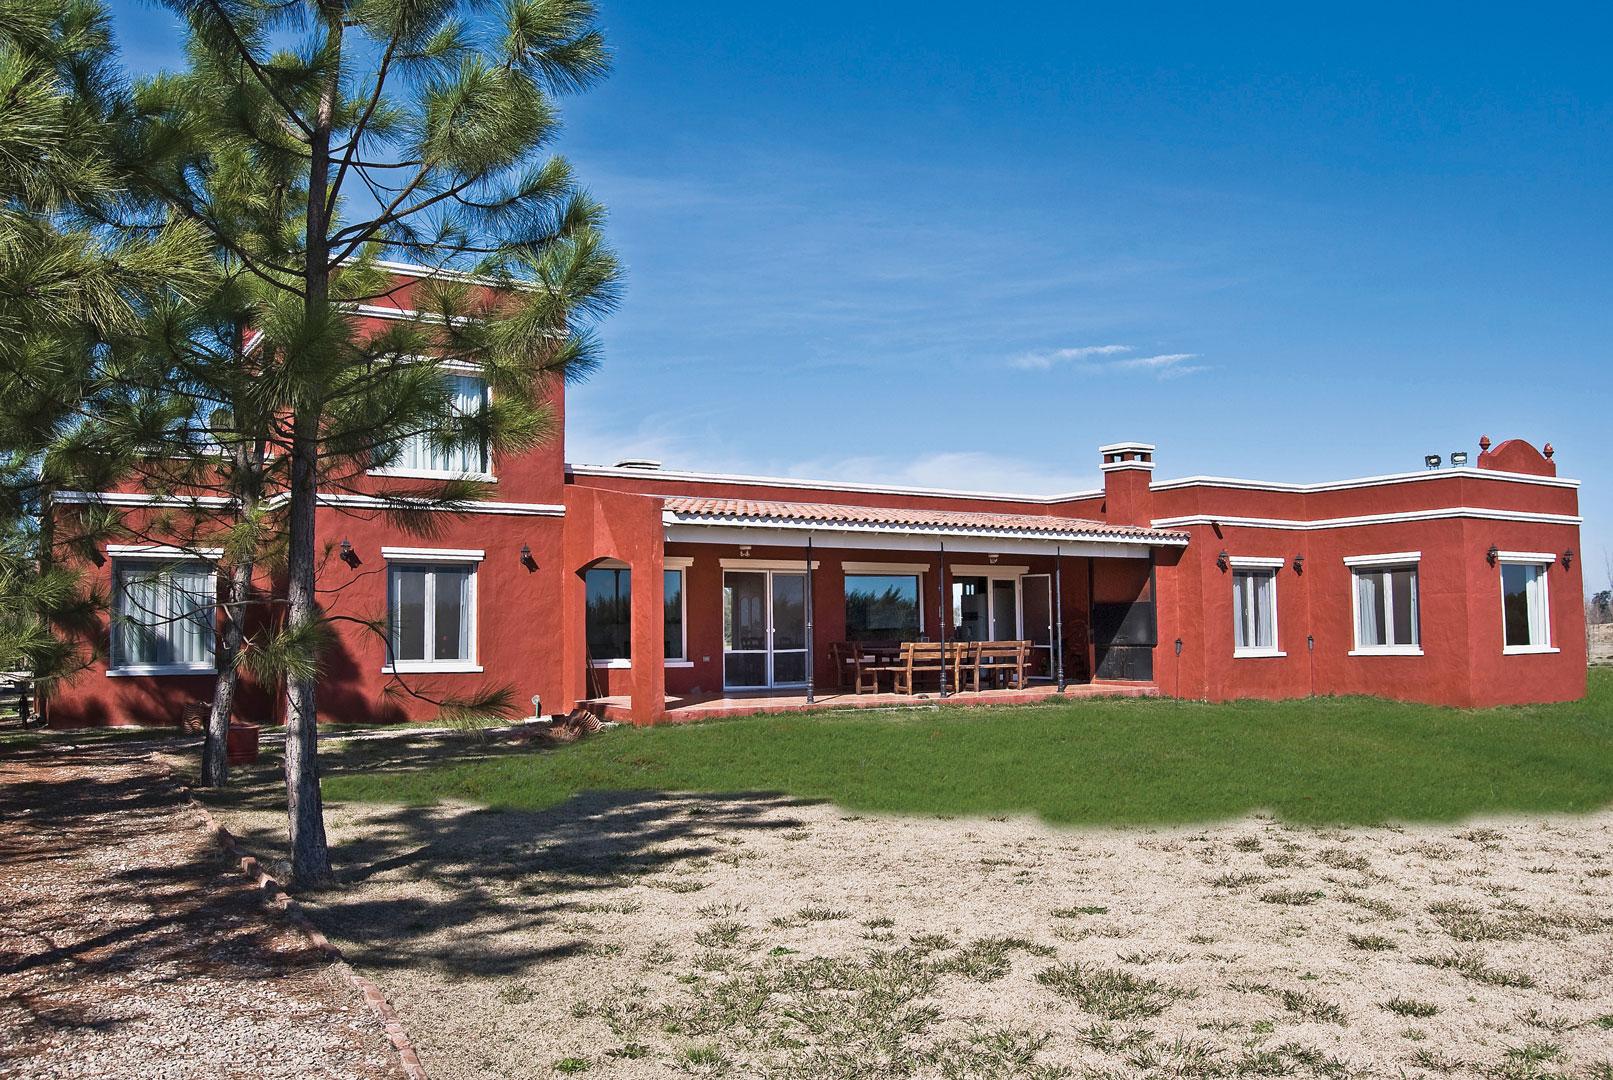 Casa de campo argentino portal de arquitectos for Portal de arquitectos casa de campo